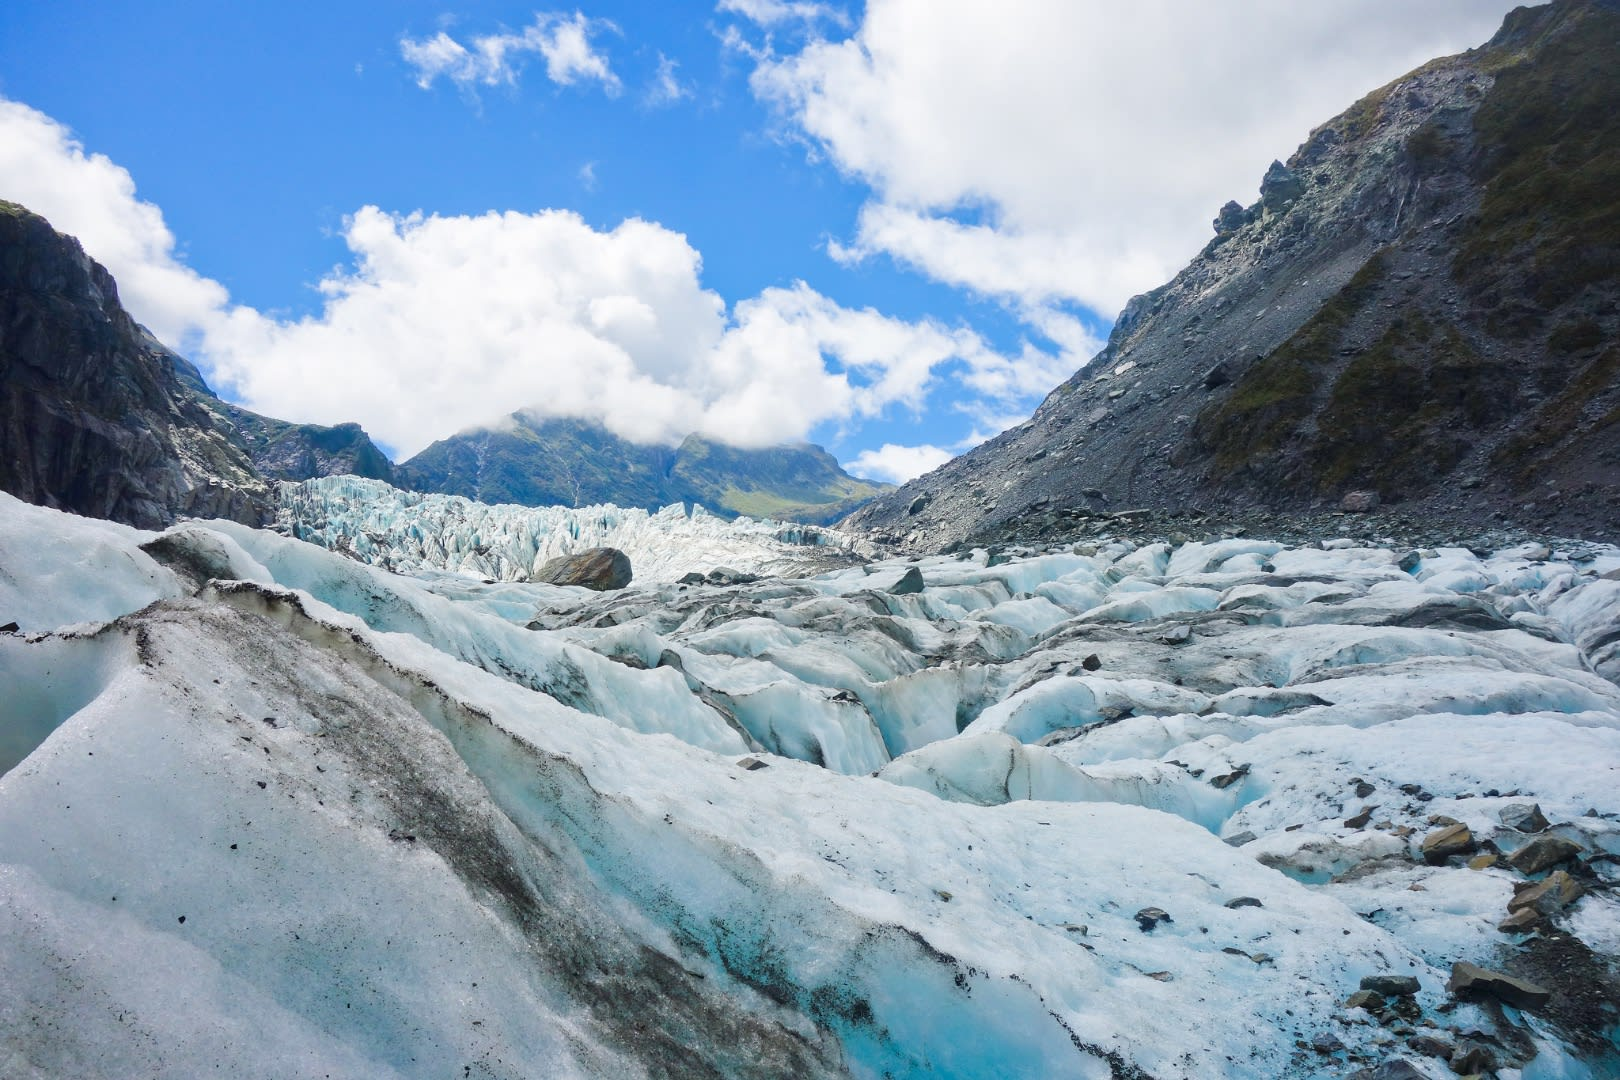 福斯冰川(Fox Glacier),紐西蘭